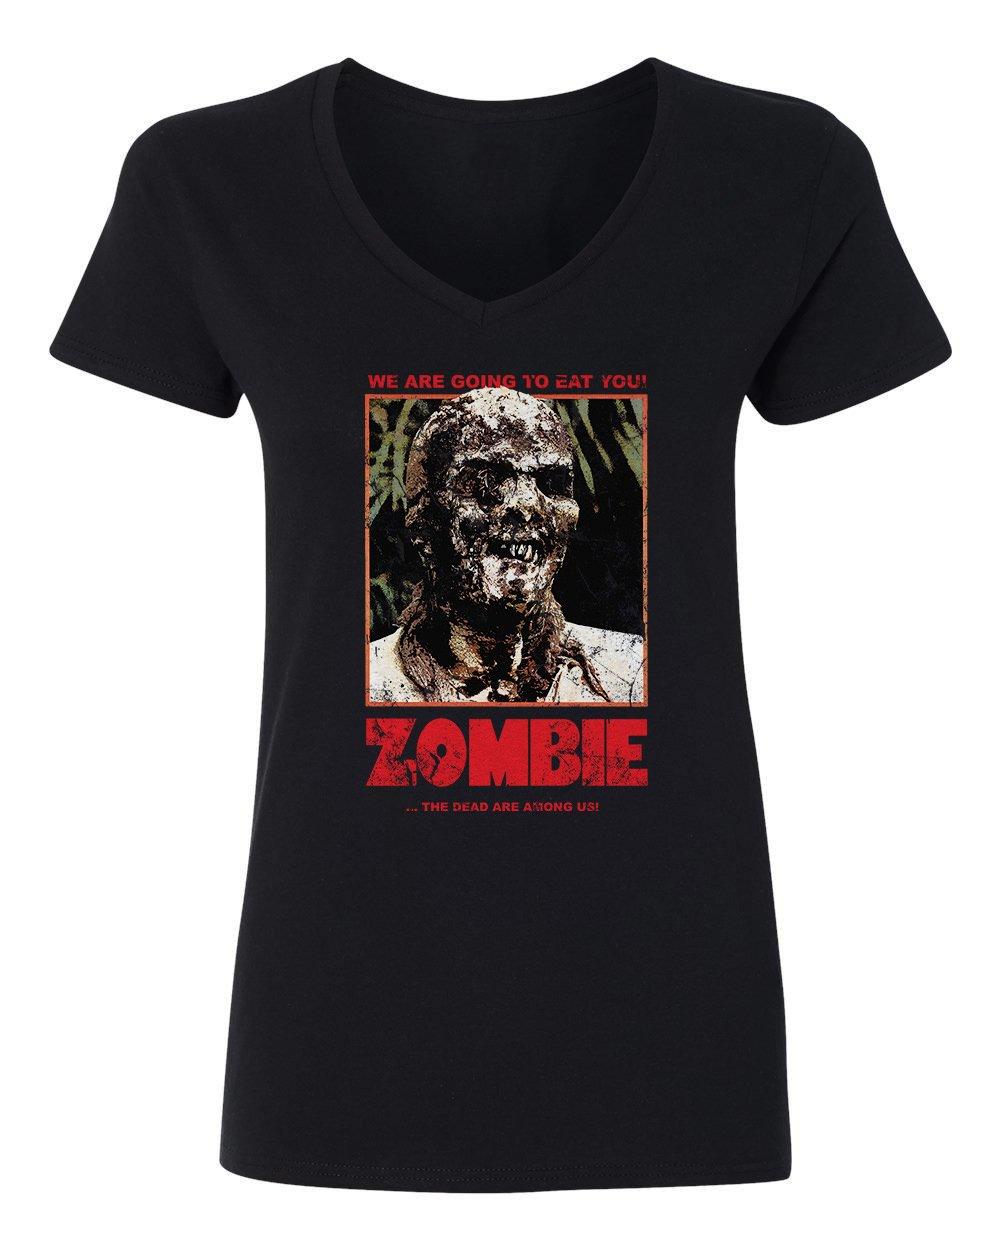 New Novelty Tee Vintage 70s Horror Movie Zombie Vneck Tshirt